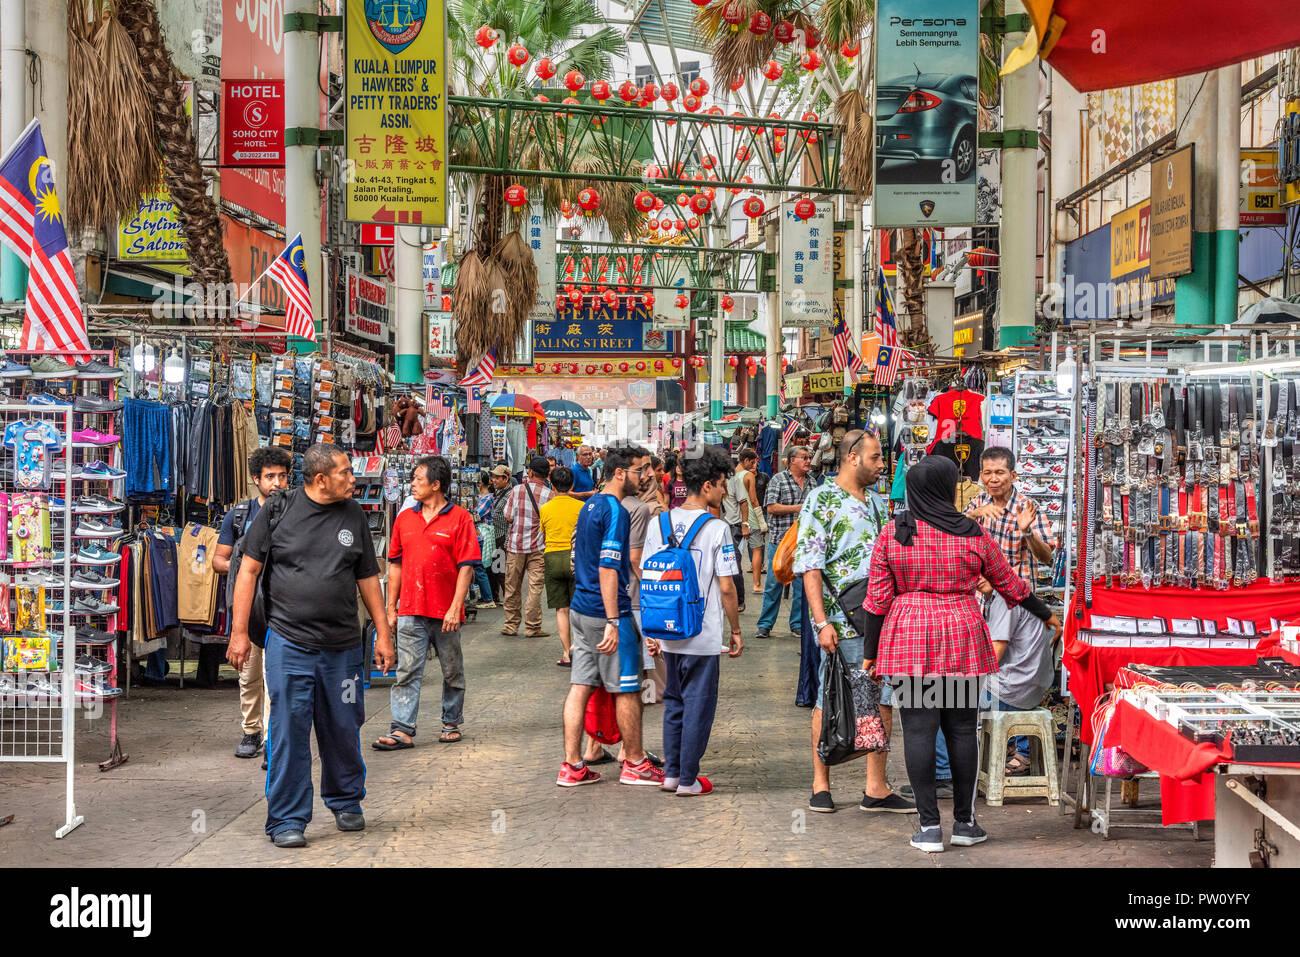 Petaling Street, Chinatown, Kuala Lumpur, Malaisie Photo Stock